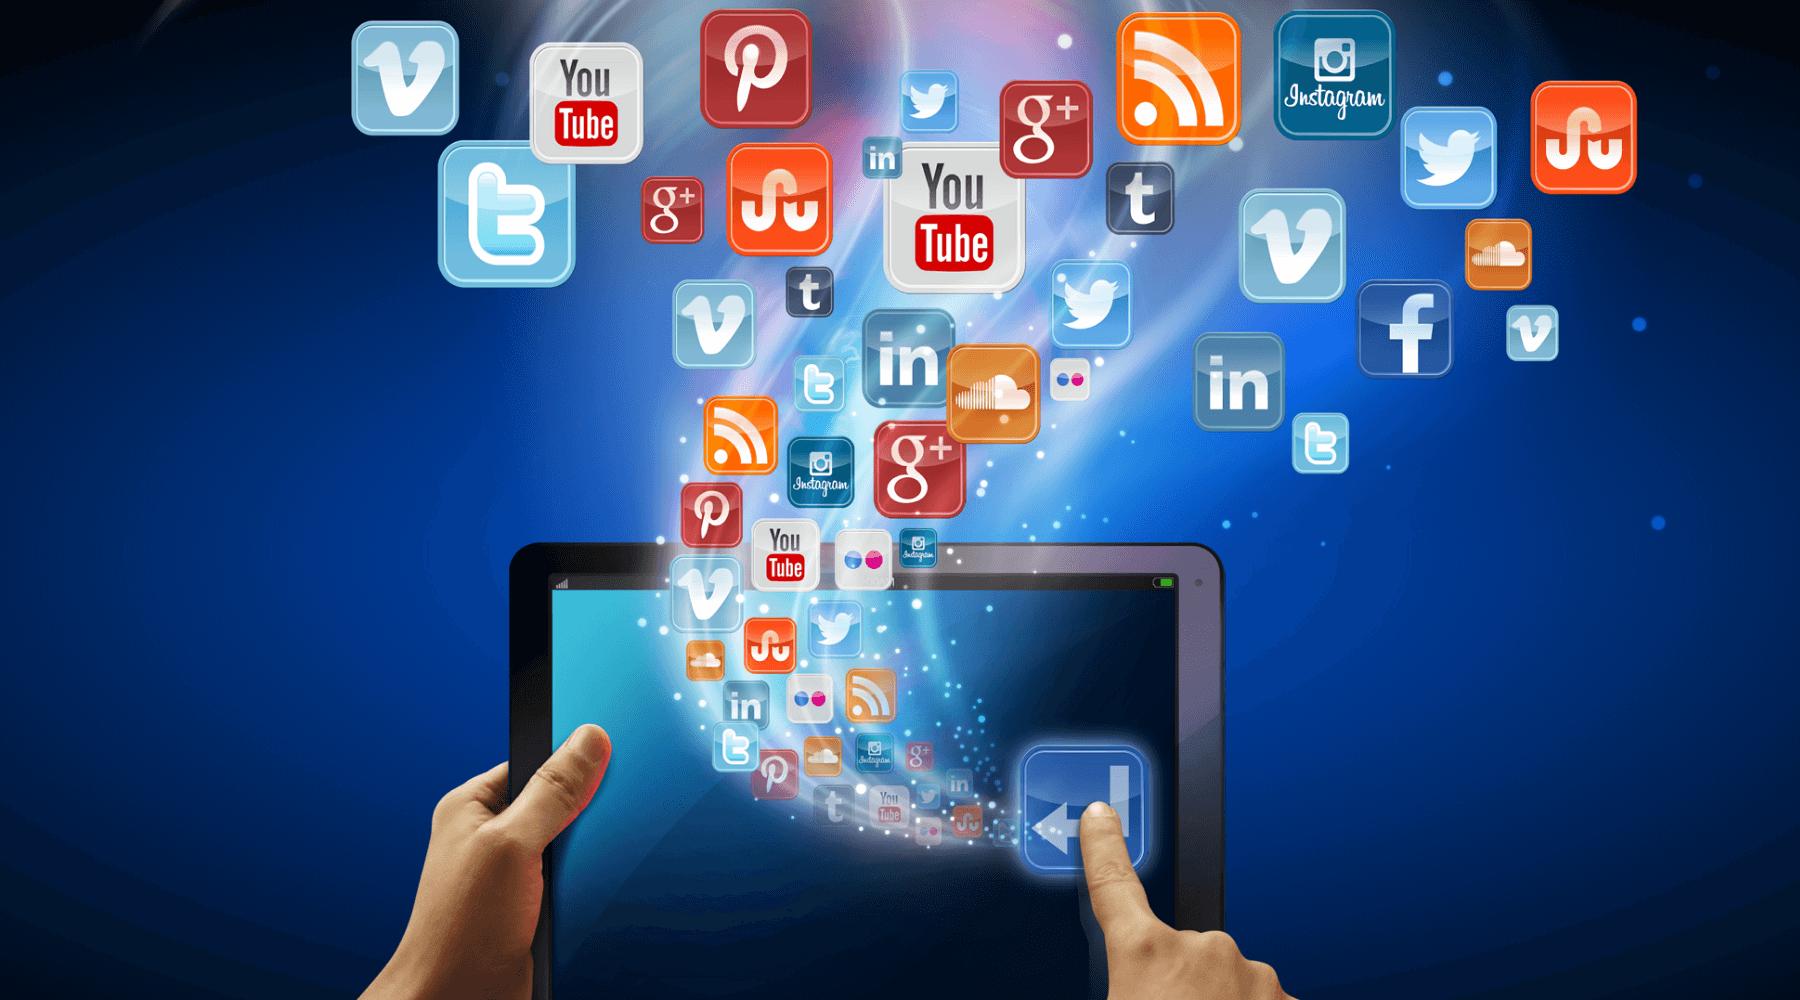 Top 10 Social Media Exchange Sites